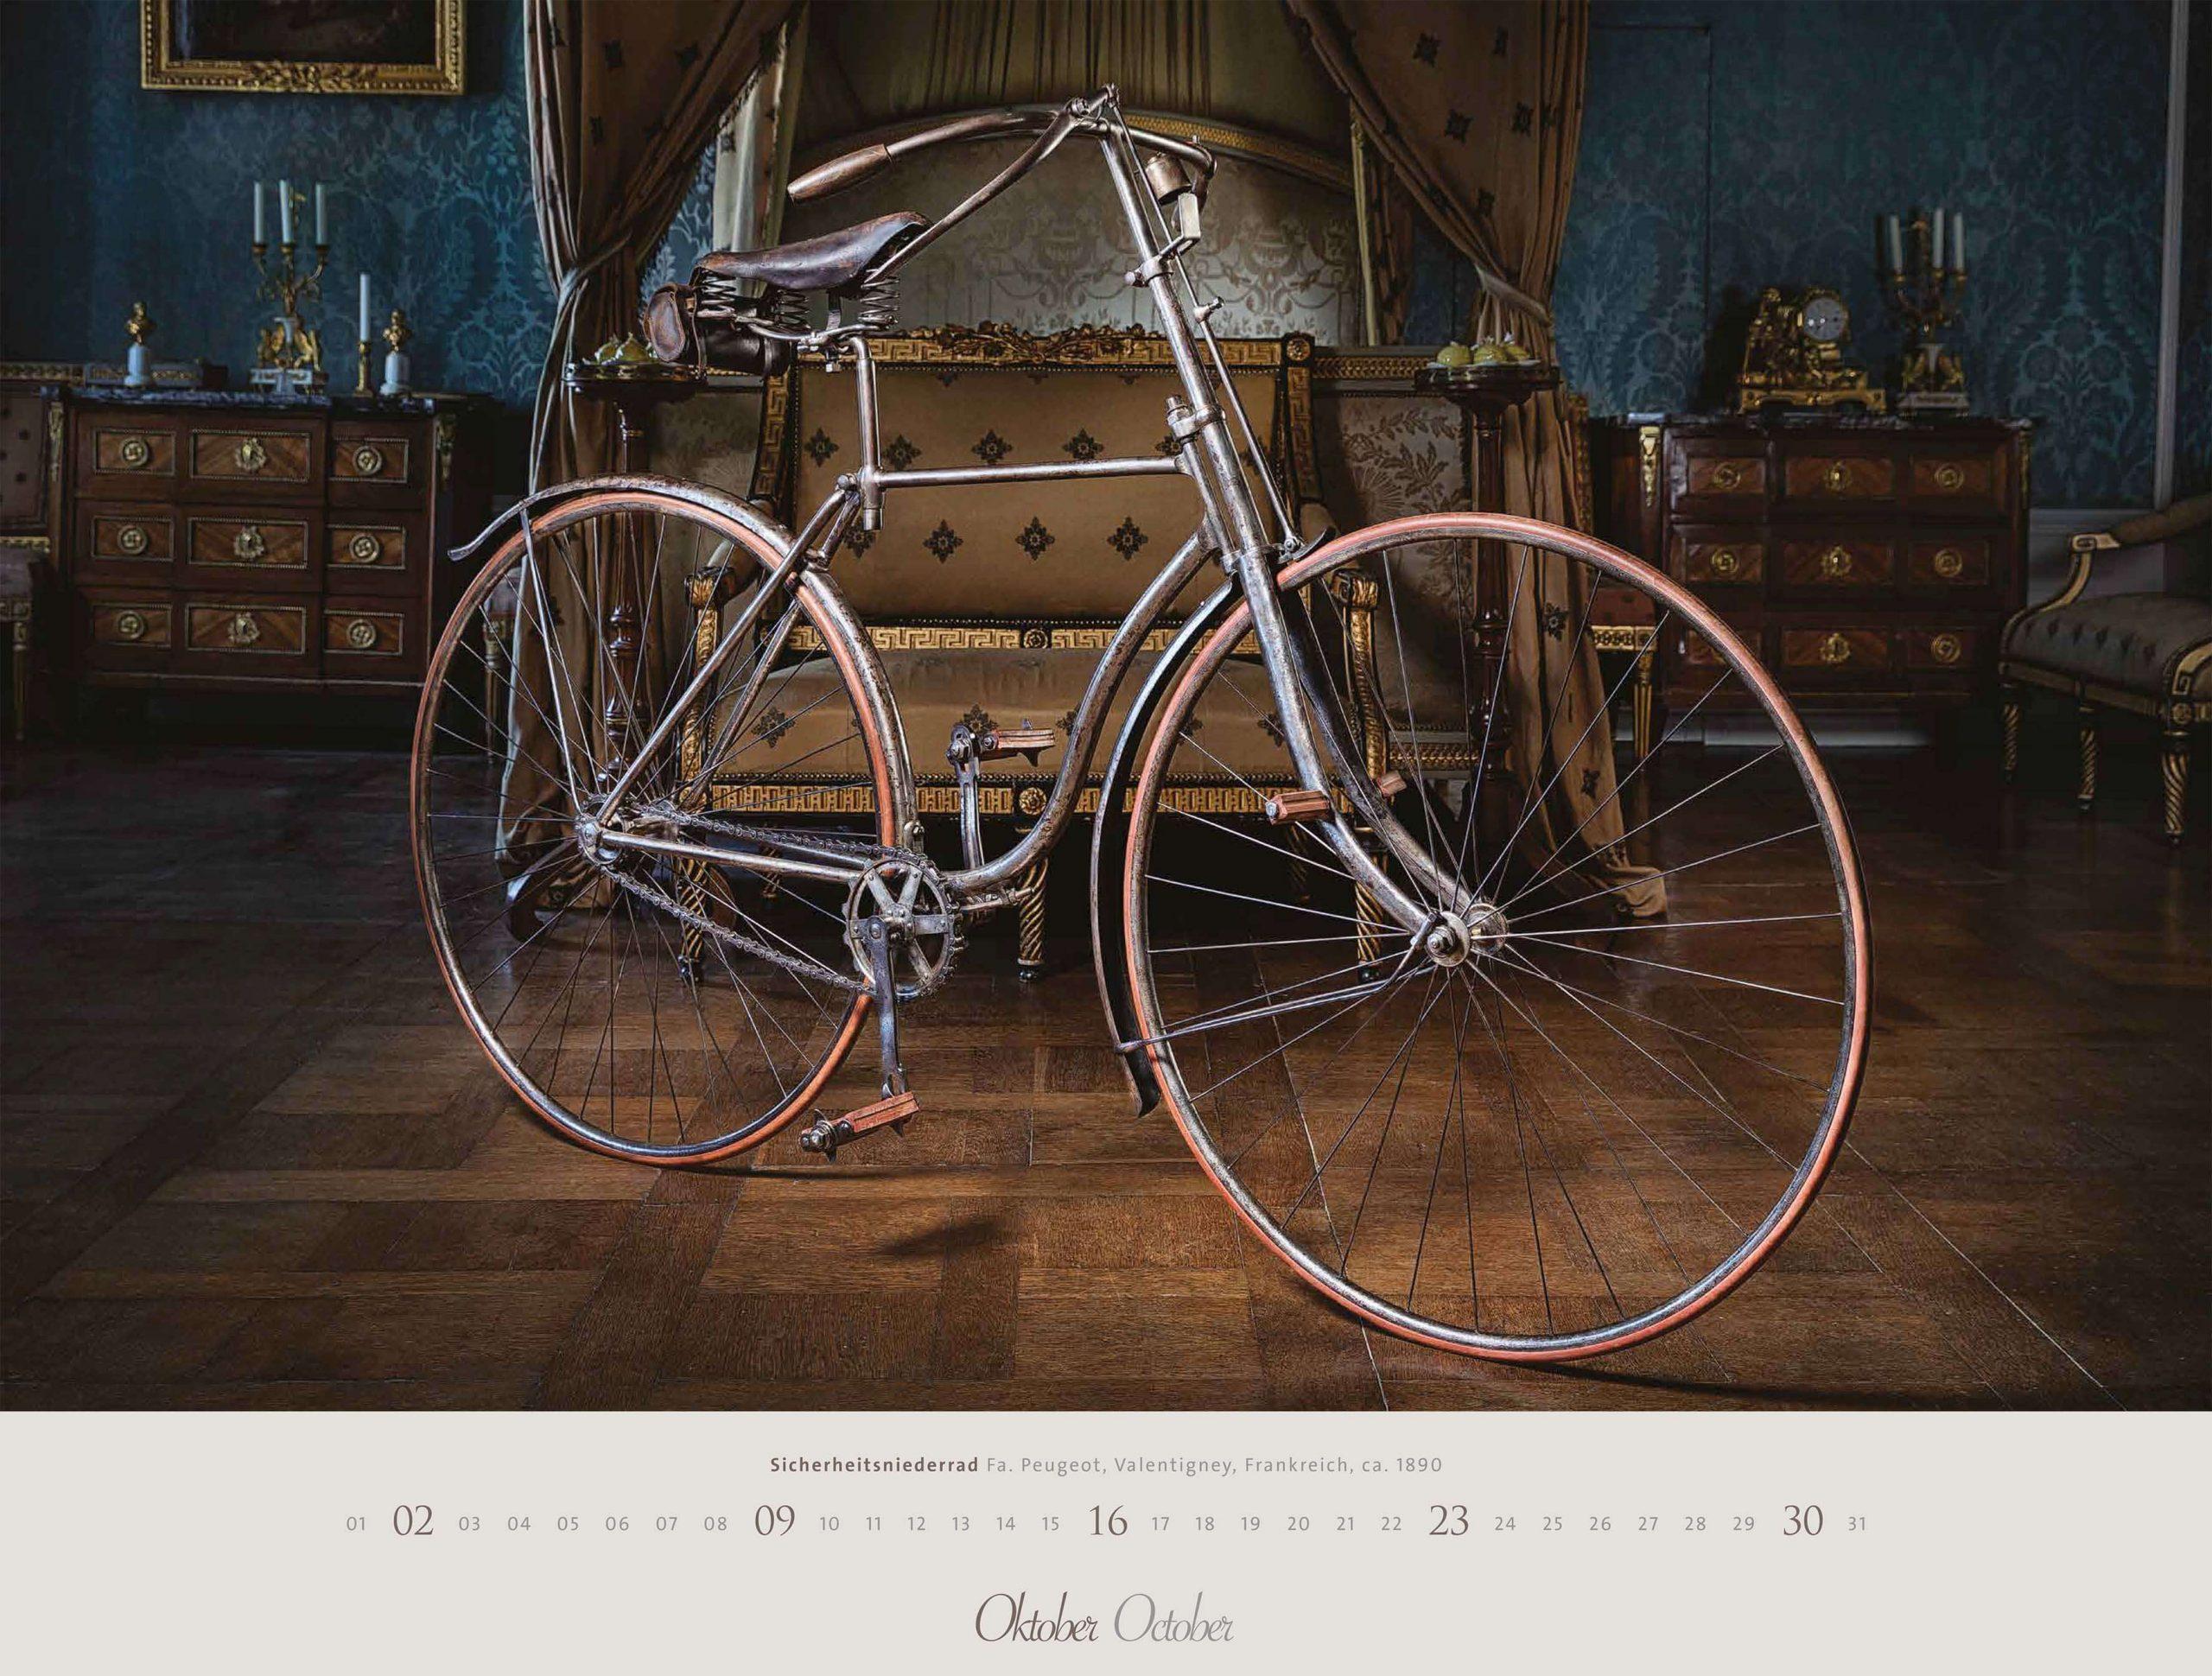 Fa. Peugeot, Valentigney, Frankreich, ca. 1890